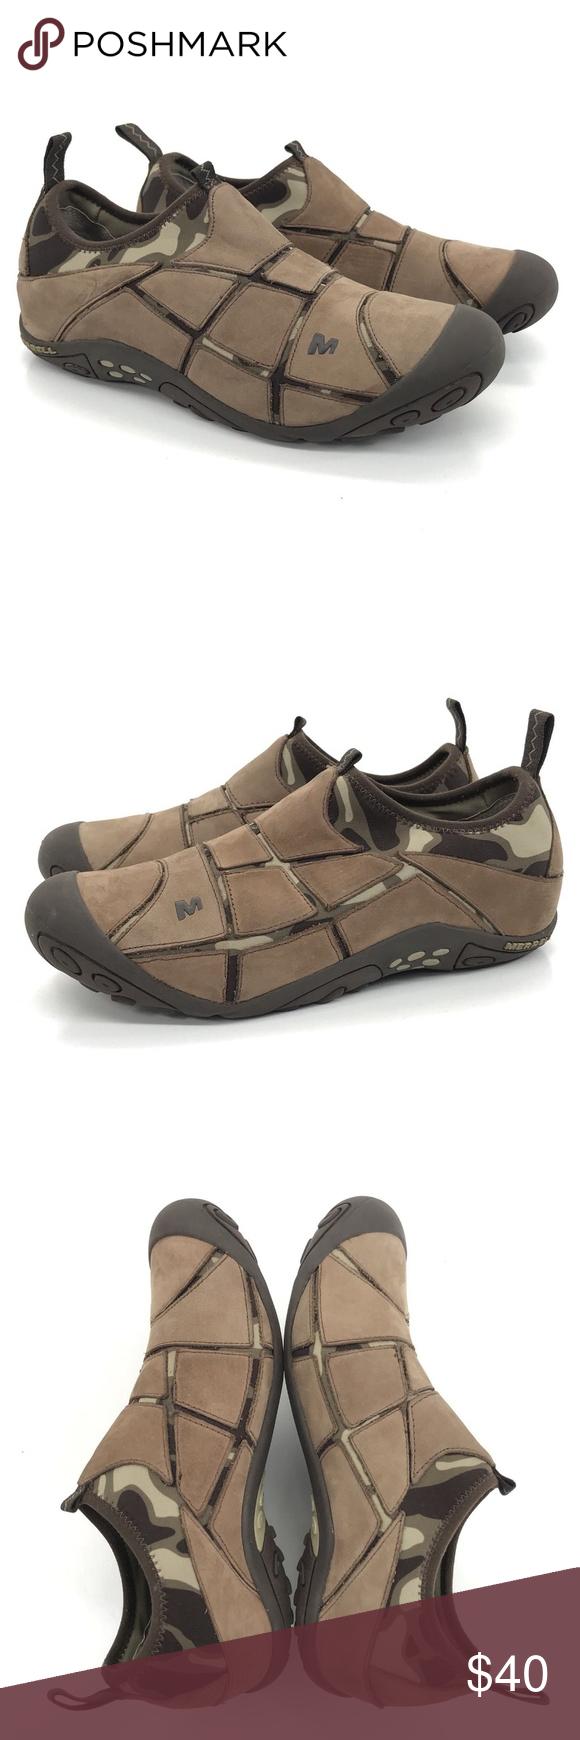 31eb48695d7d0 22 MERRELL Shoes Size 8 Mosaic Camo Nylon Leather MERRELL Shoes Size 8 Mosaic  Chocolate Brown